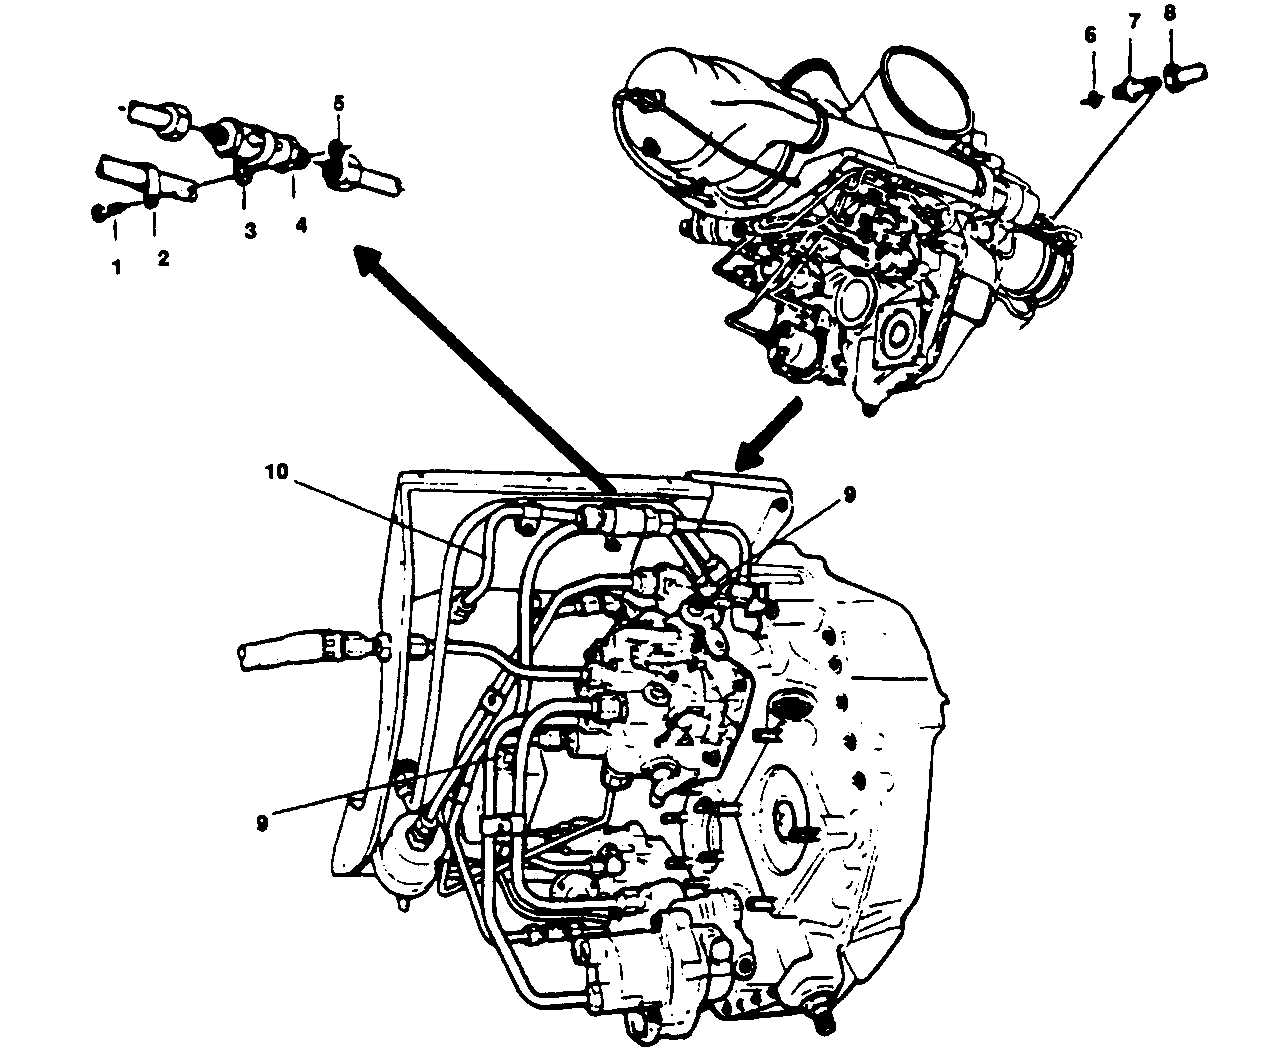 Figure 5 12 External Oil Check Valve